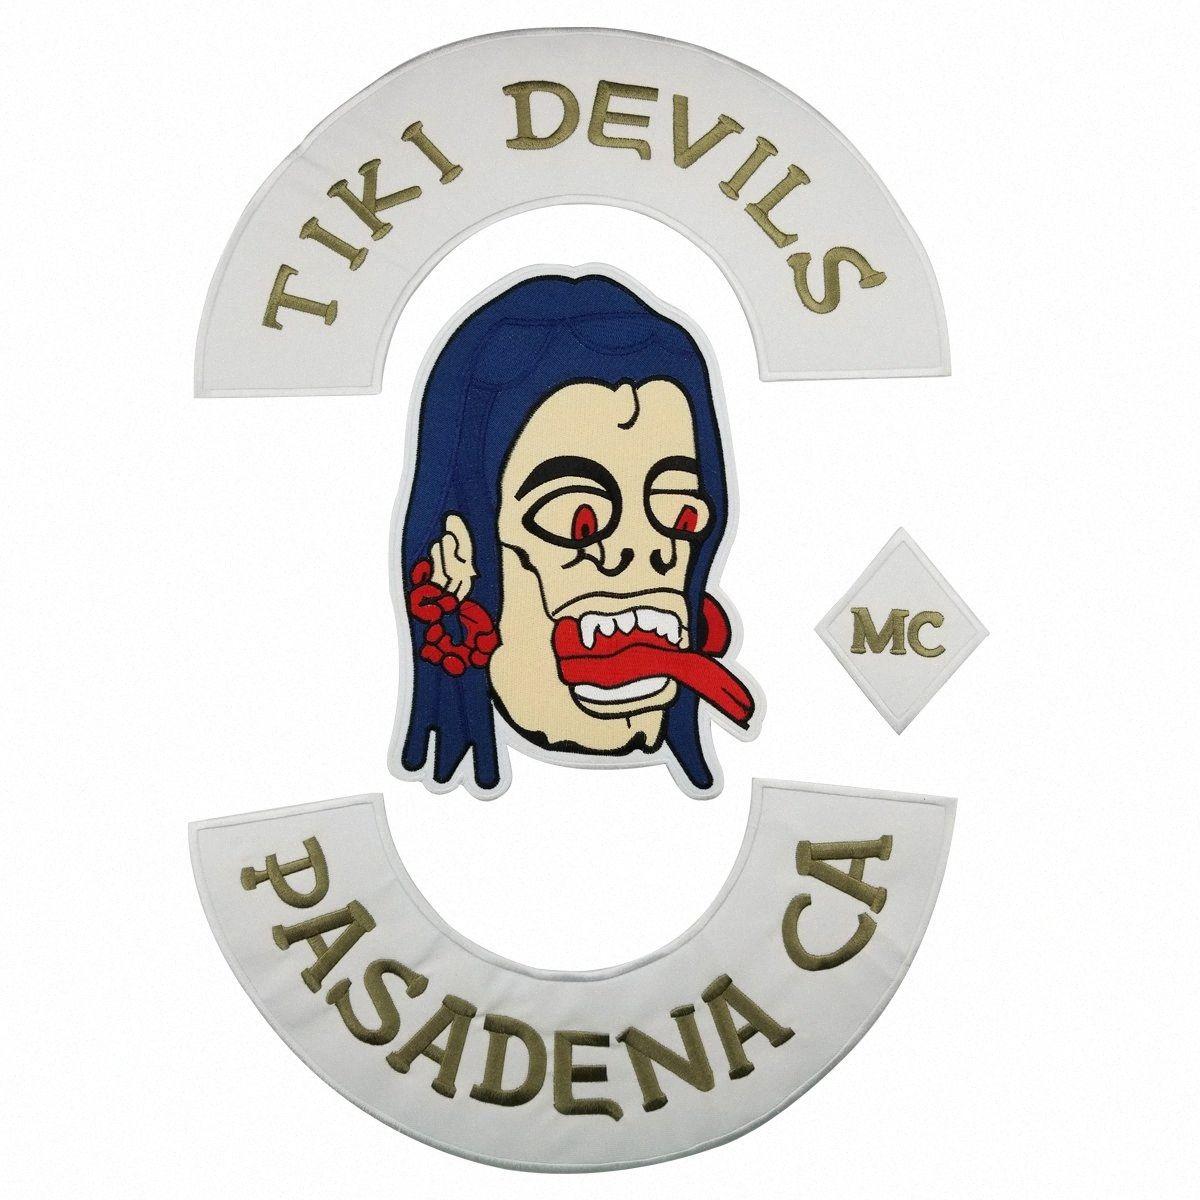 New TIKI DEVILS PASADENA CA MC Biker Skull Stickerei Mc Motorrad Club Rocker Buttom Rocker Große Rückenaufnäher Jacken Westen Schädel Patc AEbt #